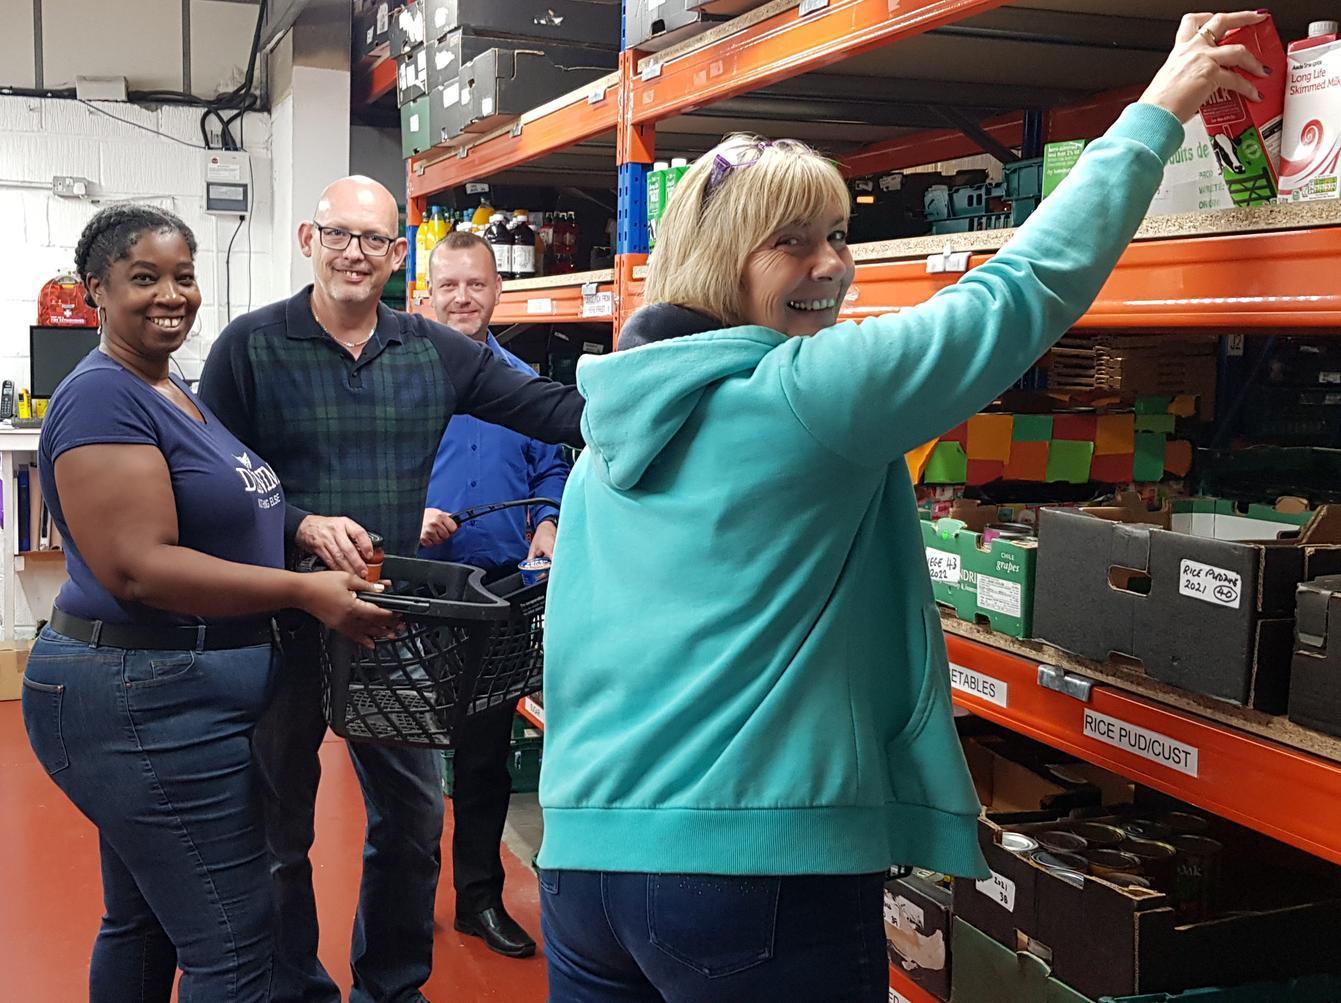 The Mall Staff Volunteer To Help Luton Foodbank Luton Today